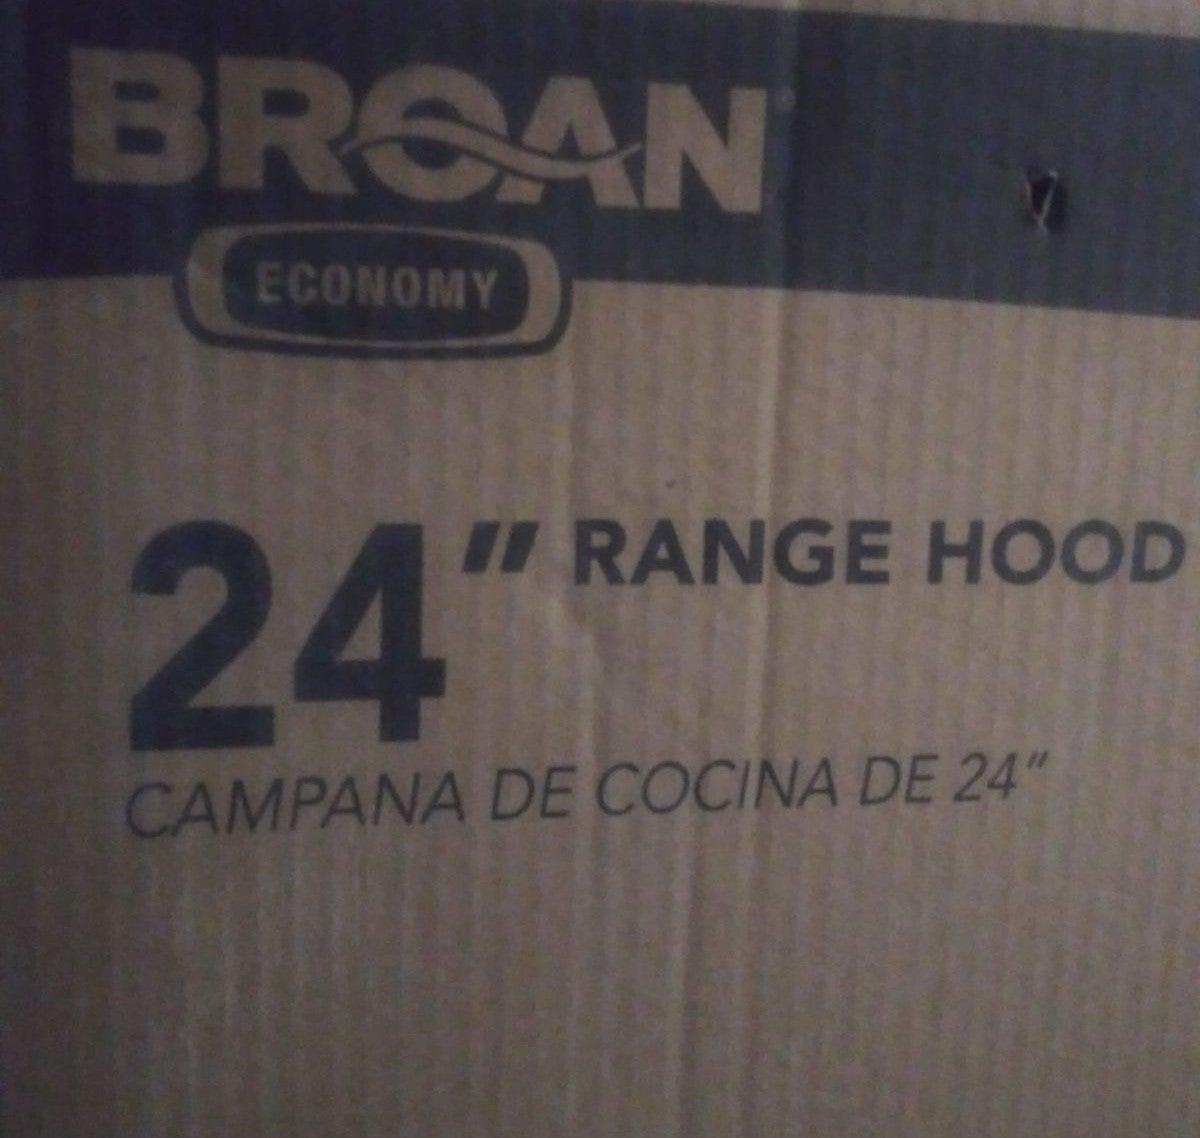 Broan 412401 Range Hood, White, 24-Inch